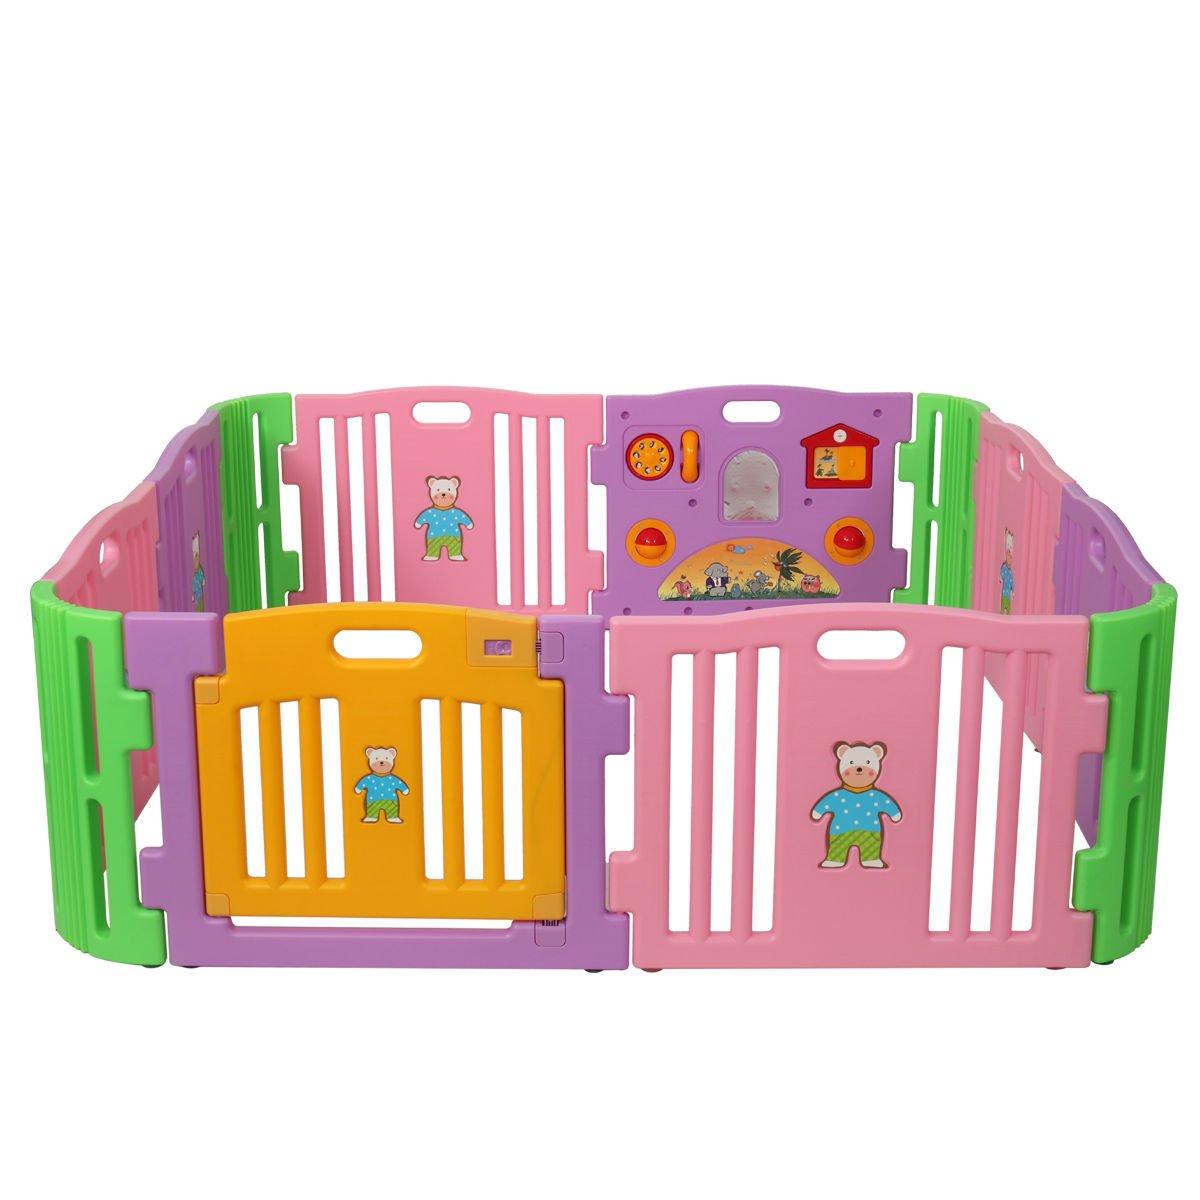 12 Playpen Portable Toddler Baby Outdoor Safety Folding Play Yard Random Indoor